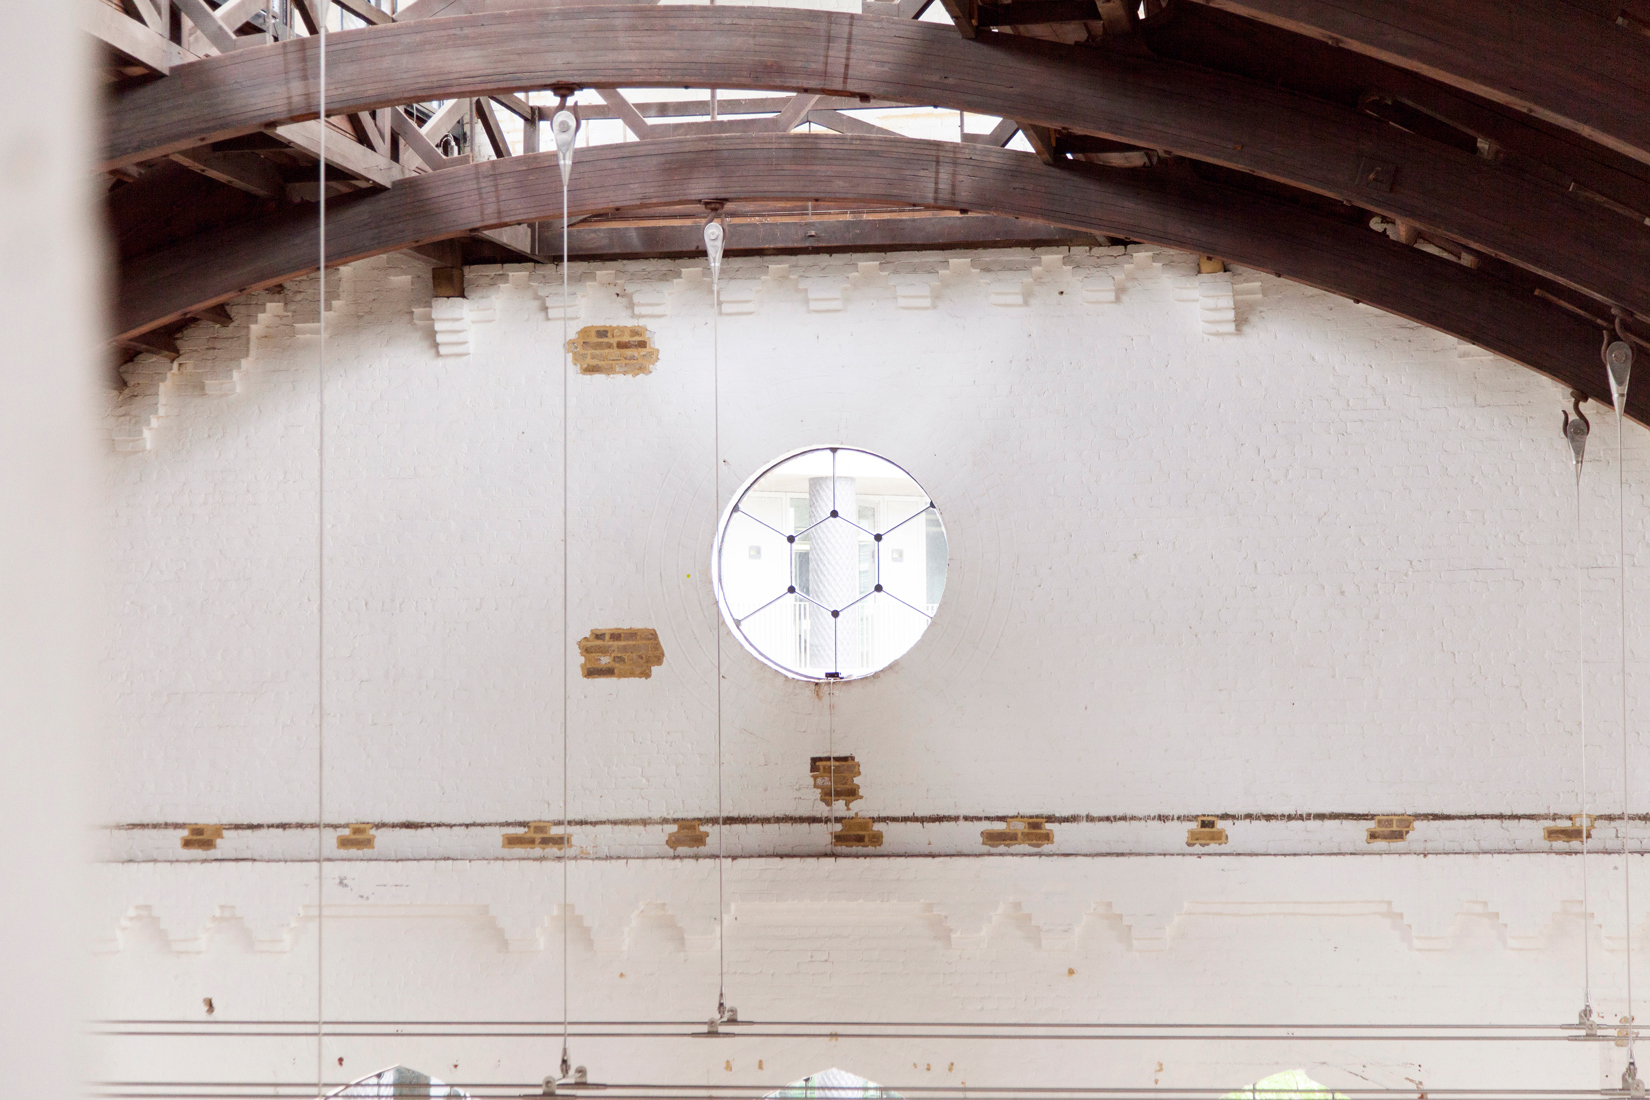 German-Gymnasium-x-The-Spaces-by-Emli-Bendixen_150515_0192